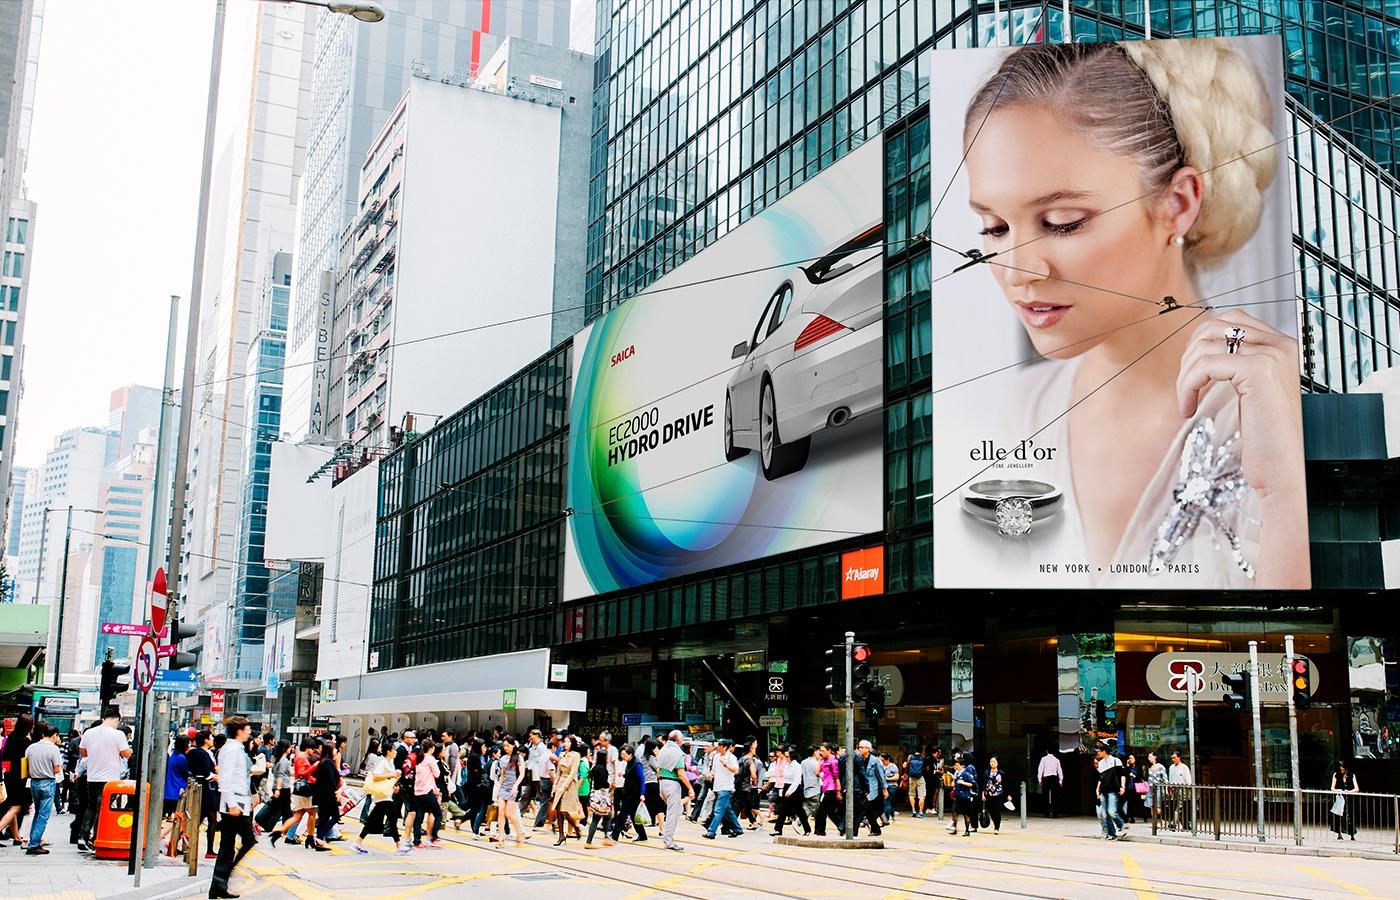 Application-outdoor-billboards-1400-x-900.jpg